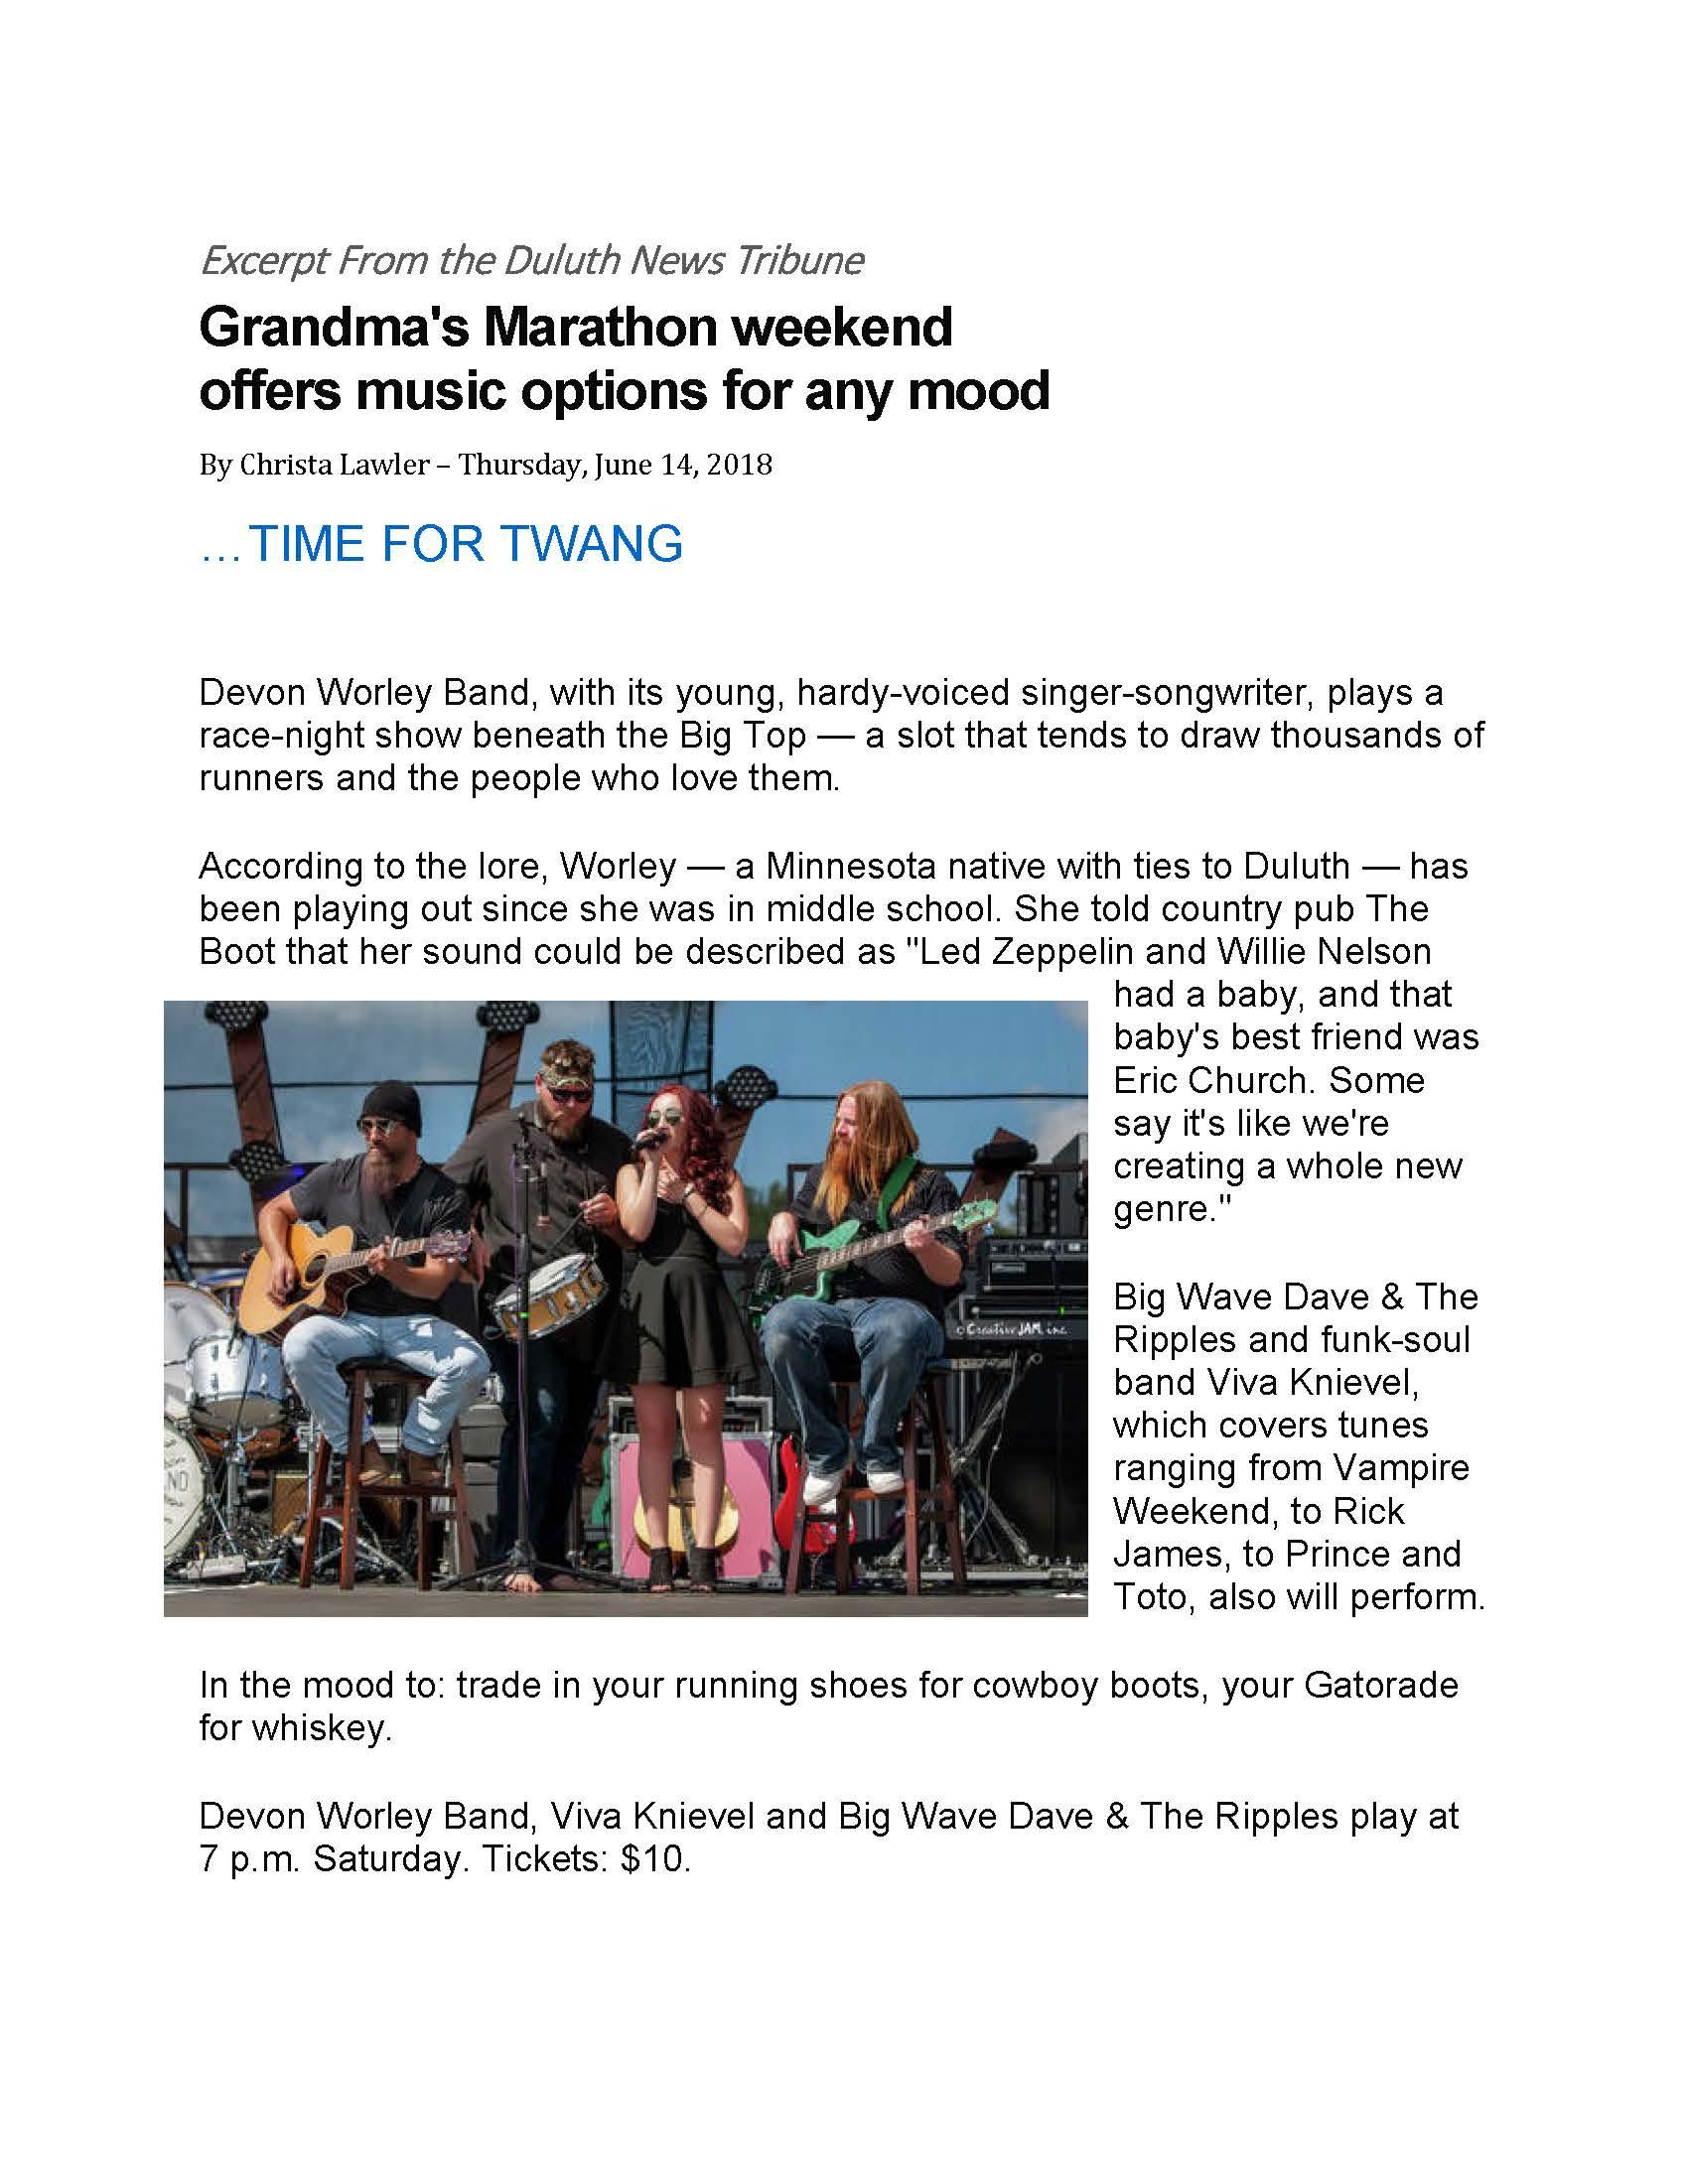 Duluth News Tribune article about Grandma's Marathon Entertainment